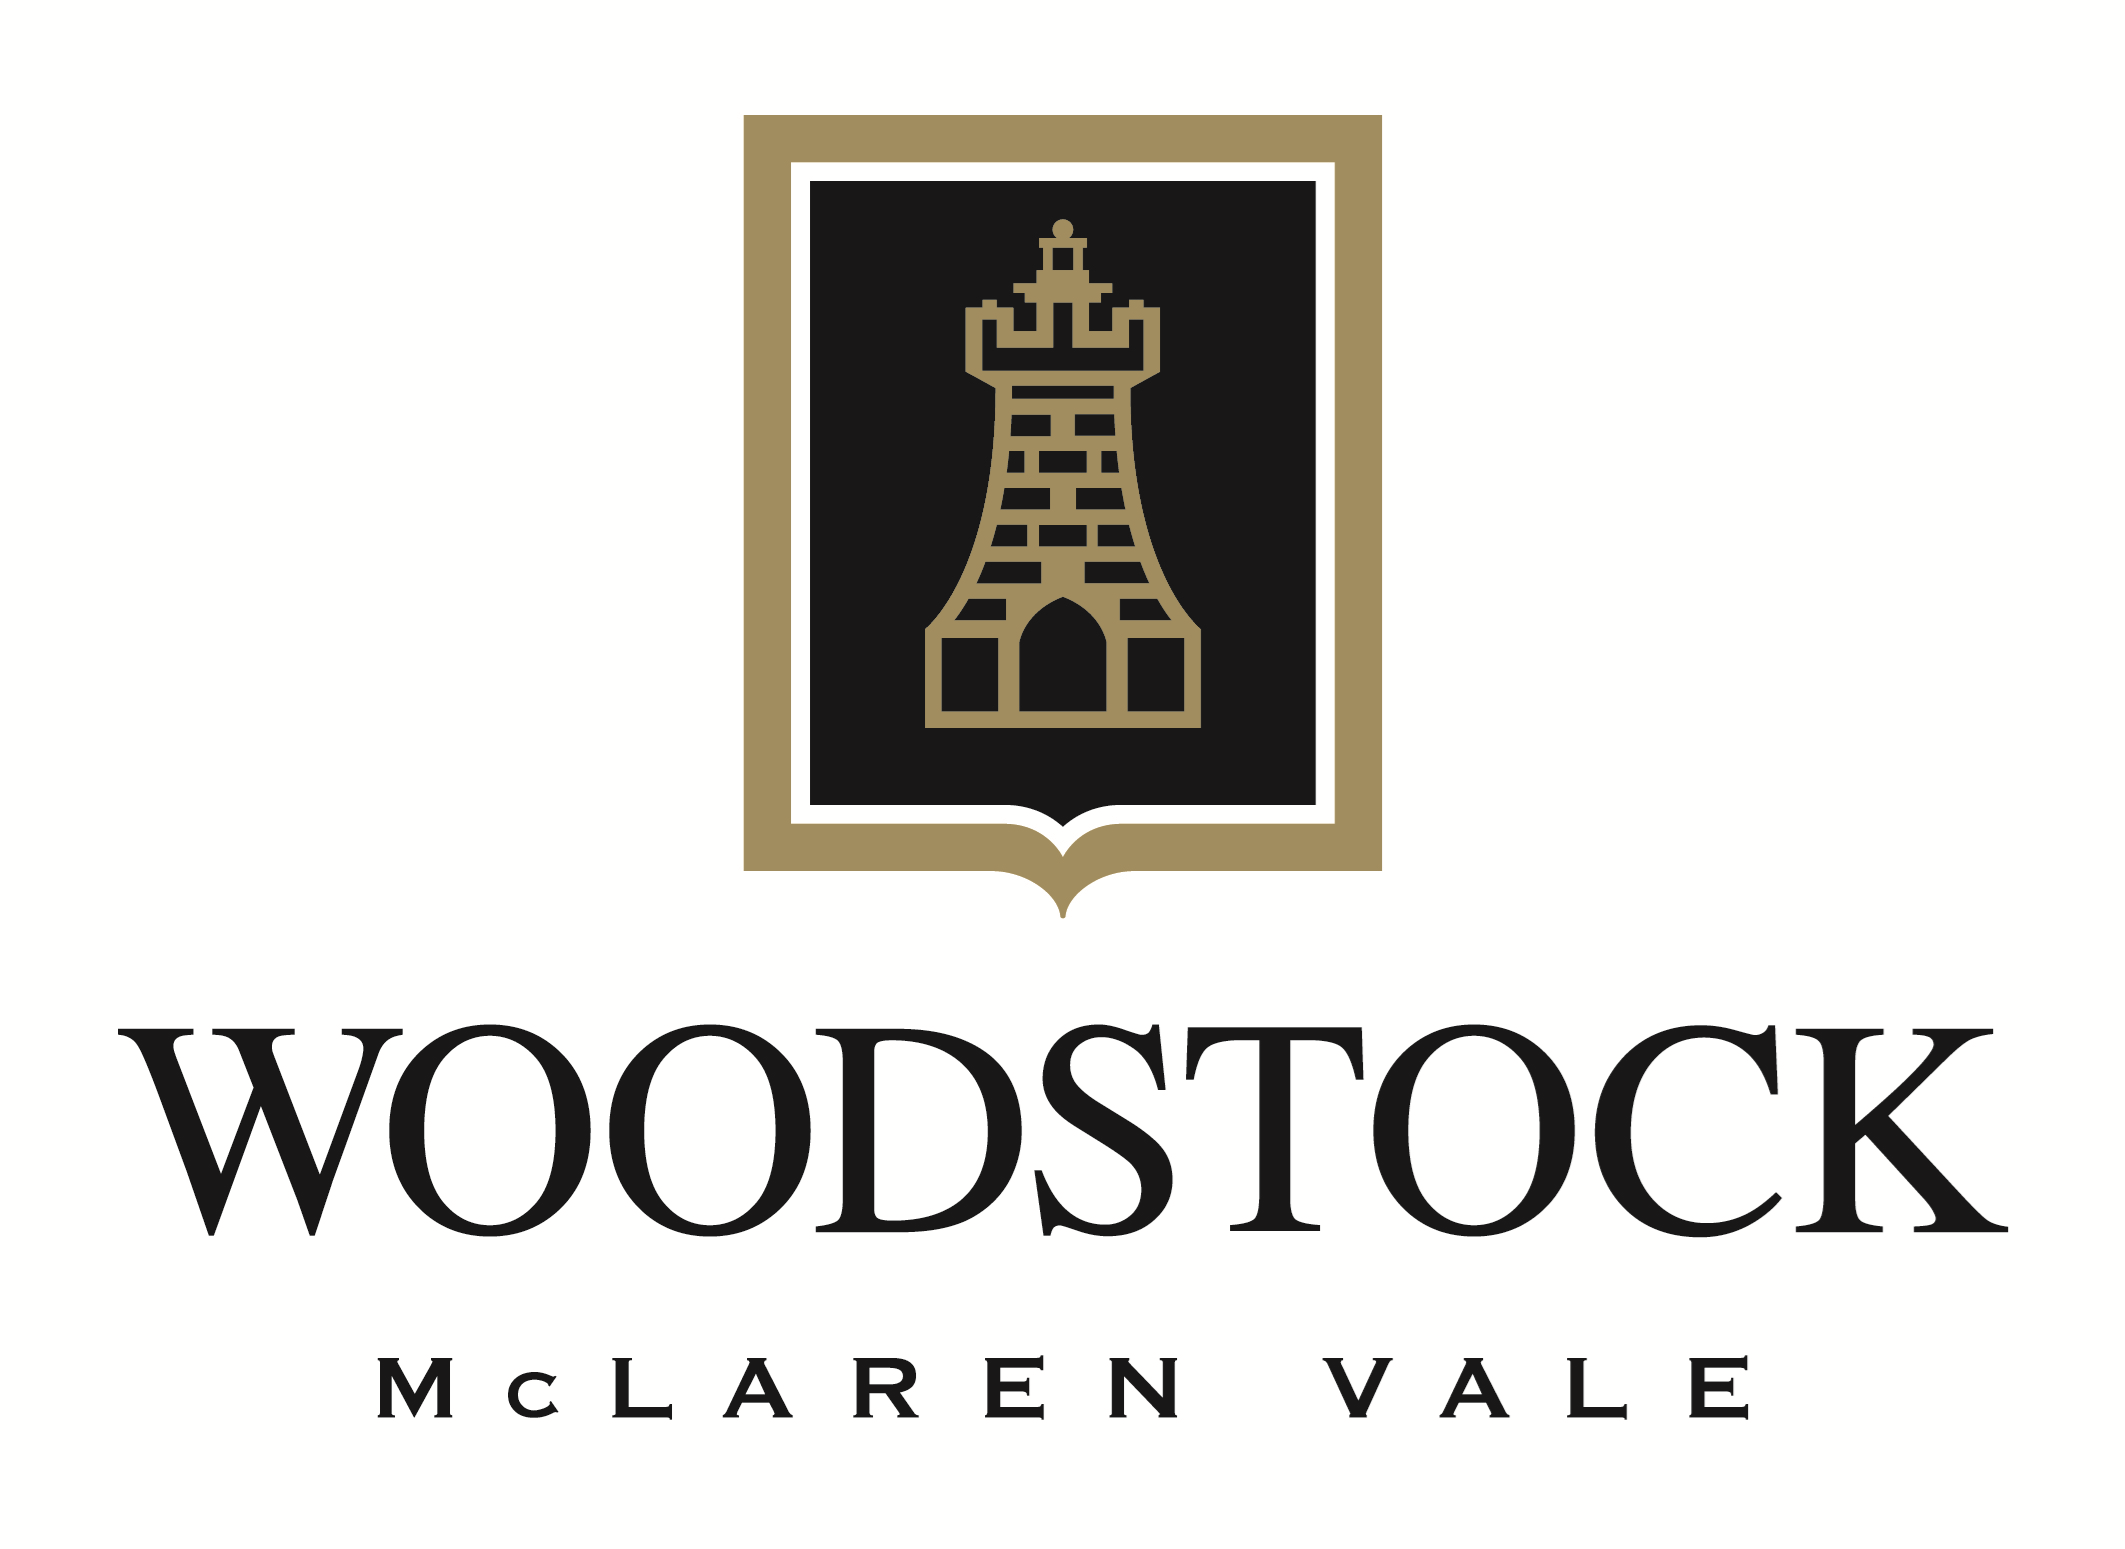 Woodstock Winery